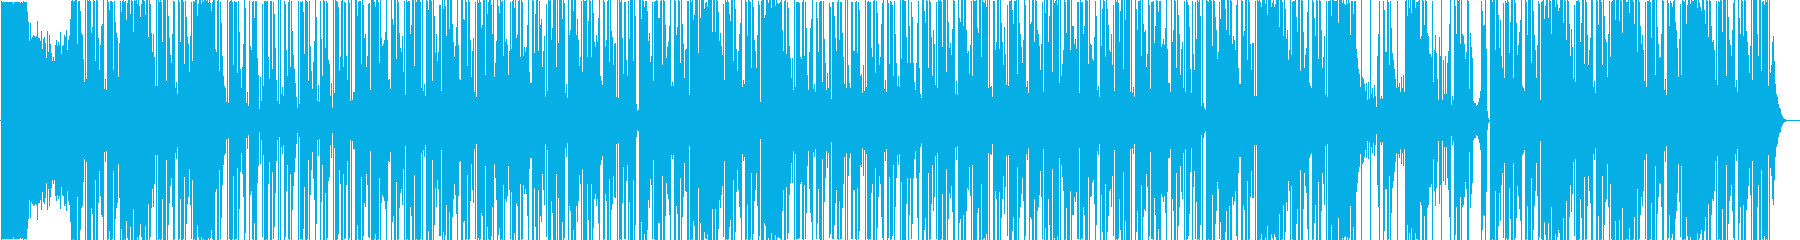 USA風HIPHOPトラックの再生済みの波形